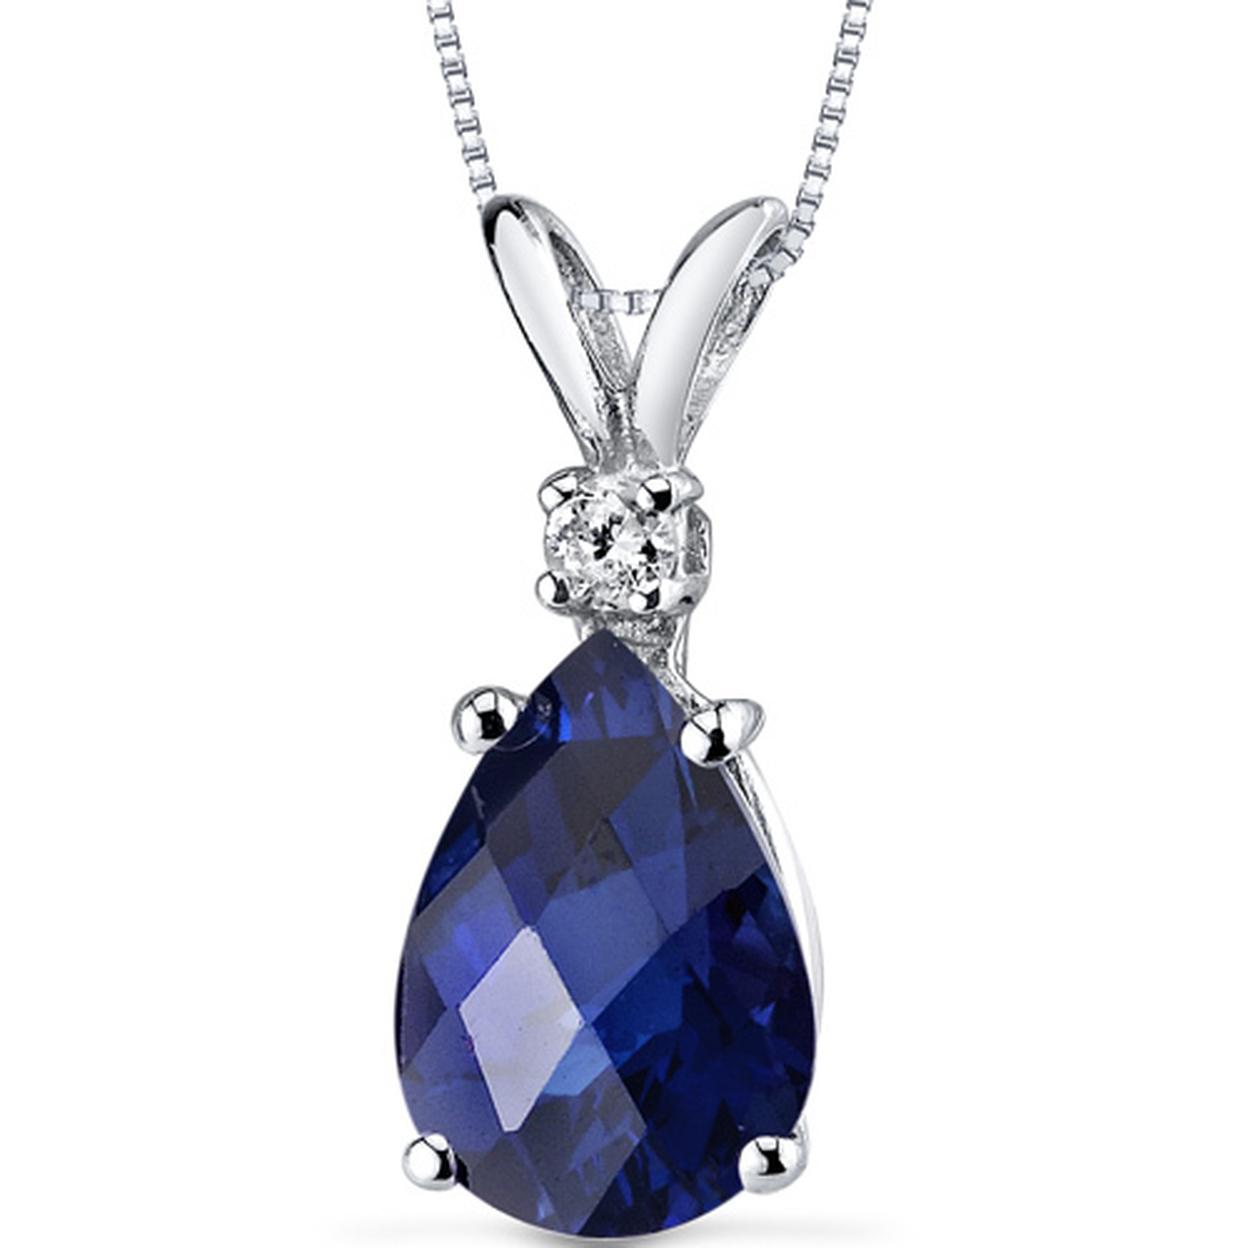 14 Karat White Gold Pear Shape 2.50 Carats Created Blue Sapphire Diamond Pendant